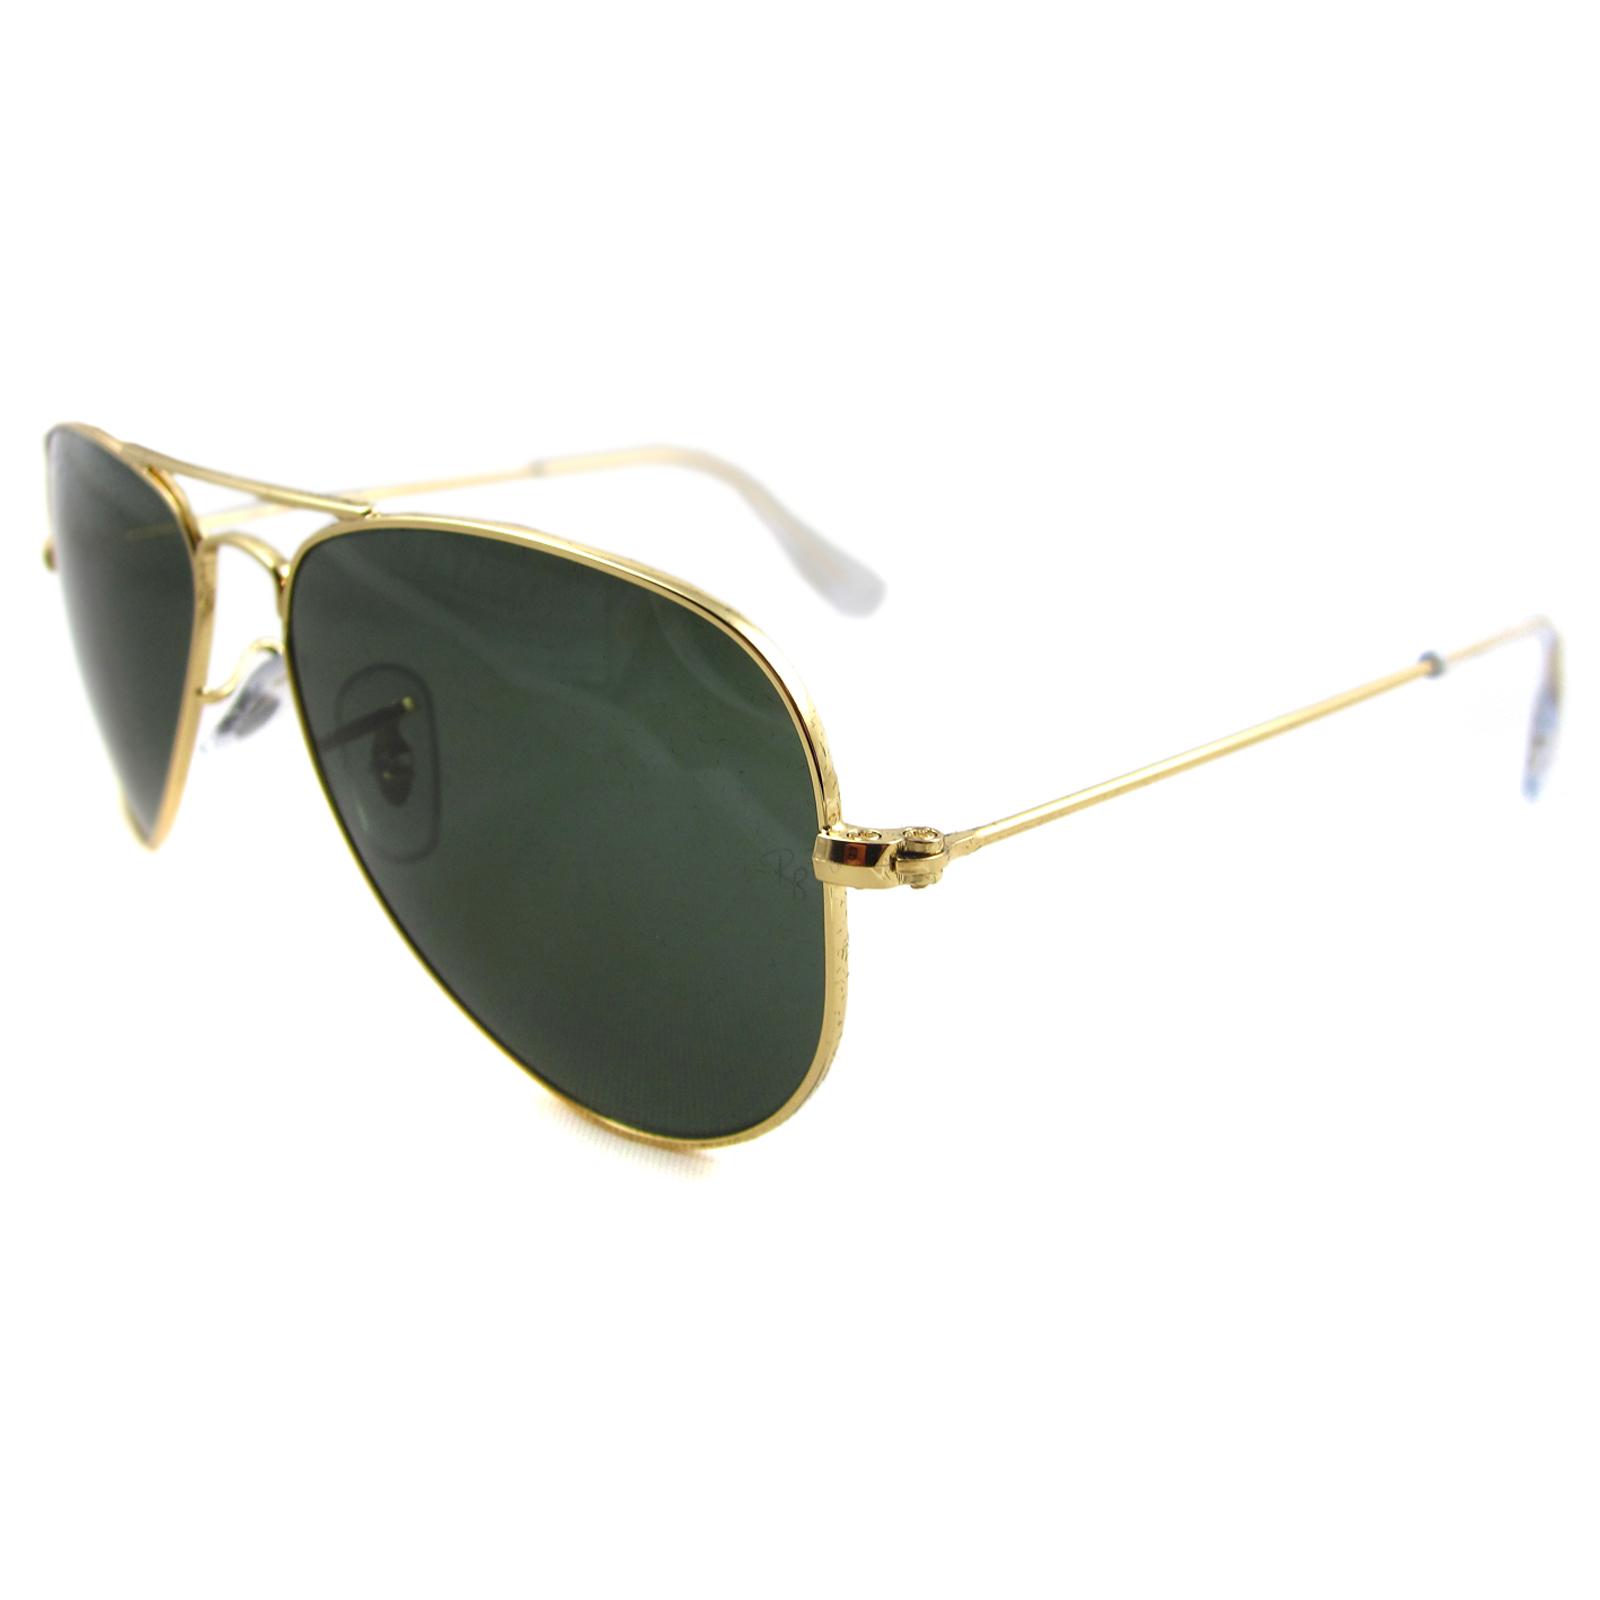 cheap ray ban small aviator 3044 sunglasses discounted sunglasses. Black Bedroom Furniture Sets. Home Design Ideas